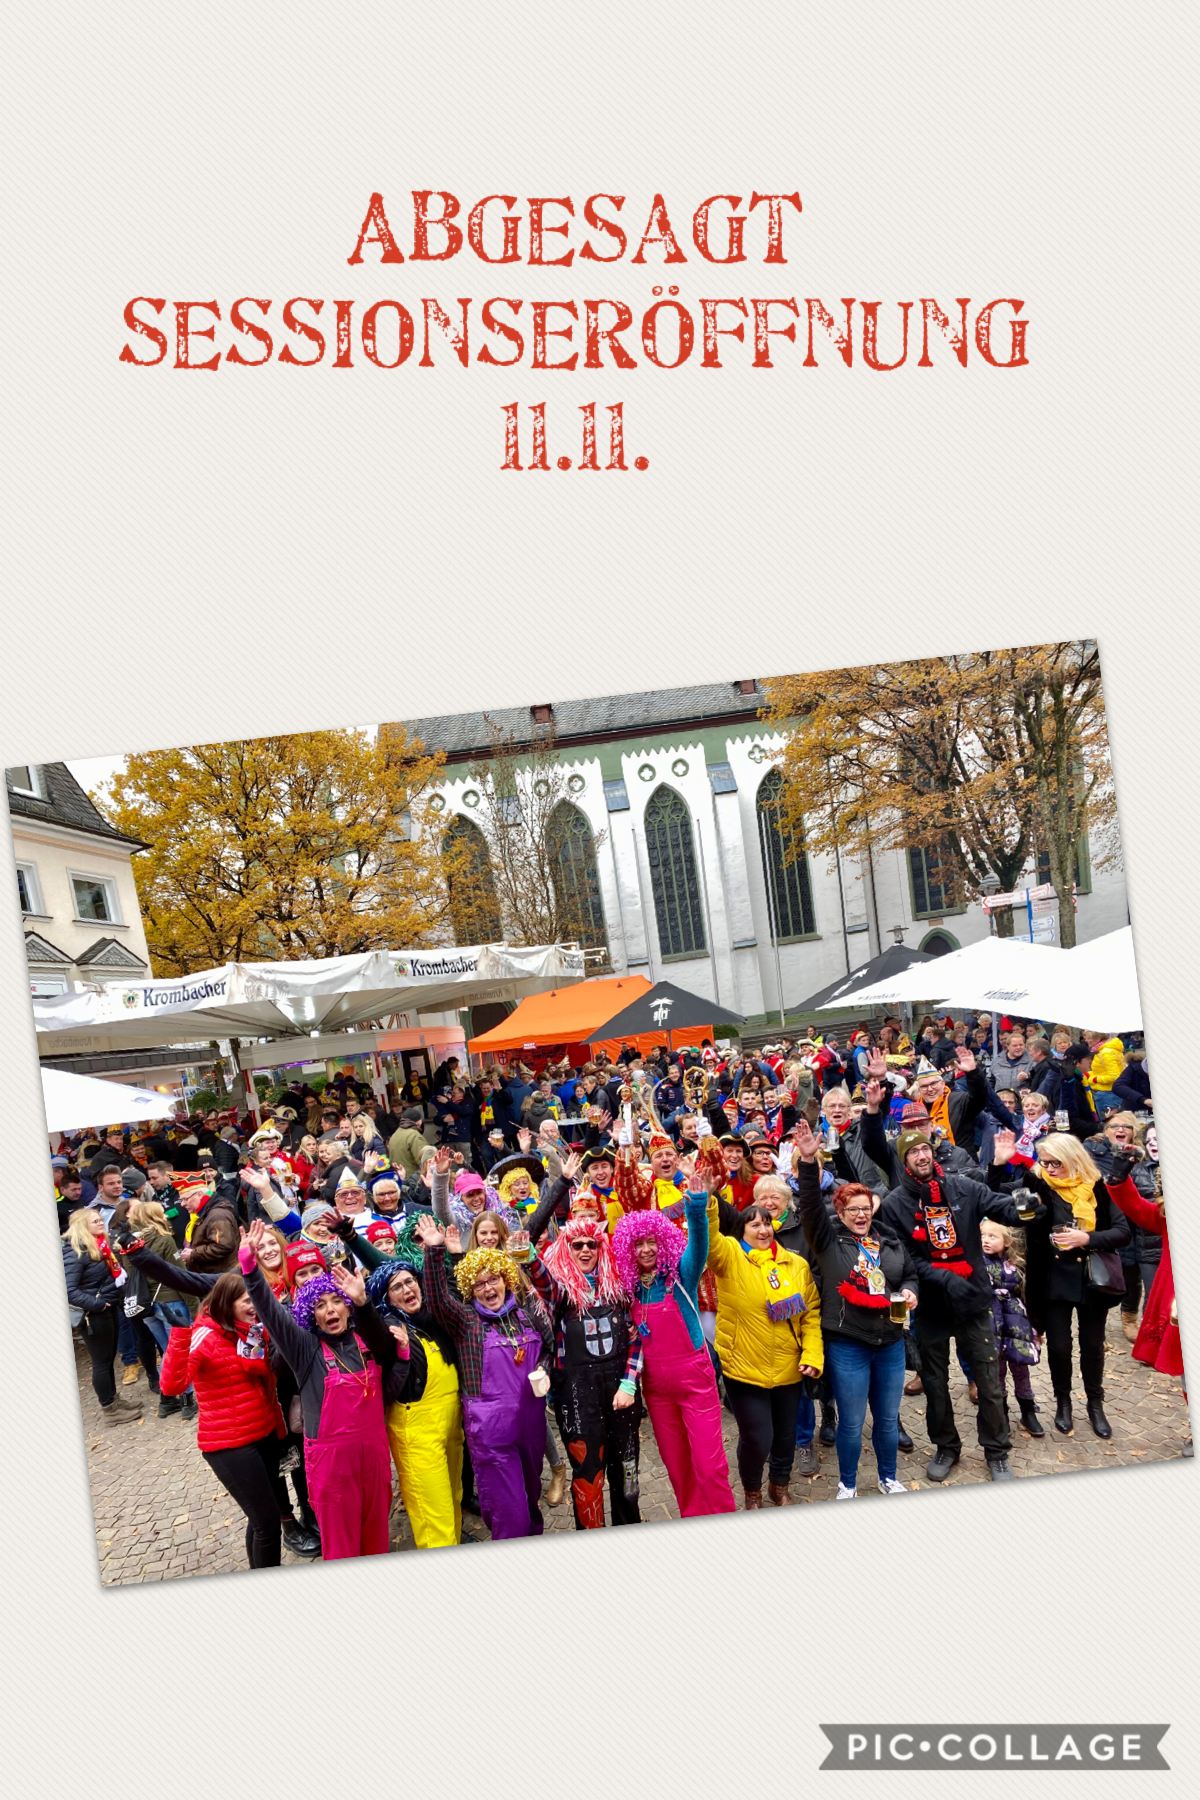 Abgesagt – Sessionseröffnung 11.11.